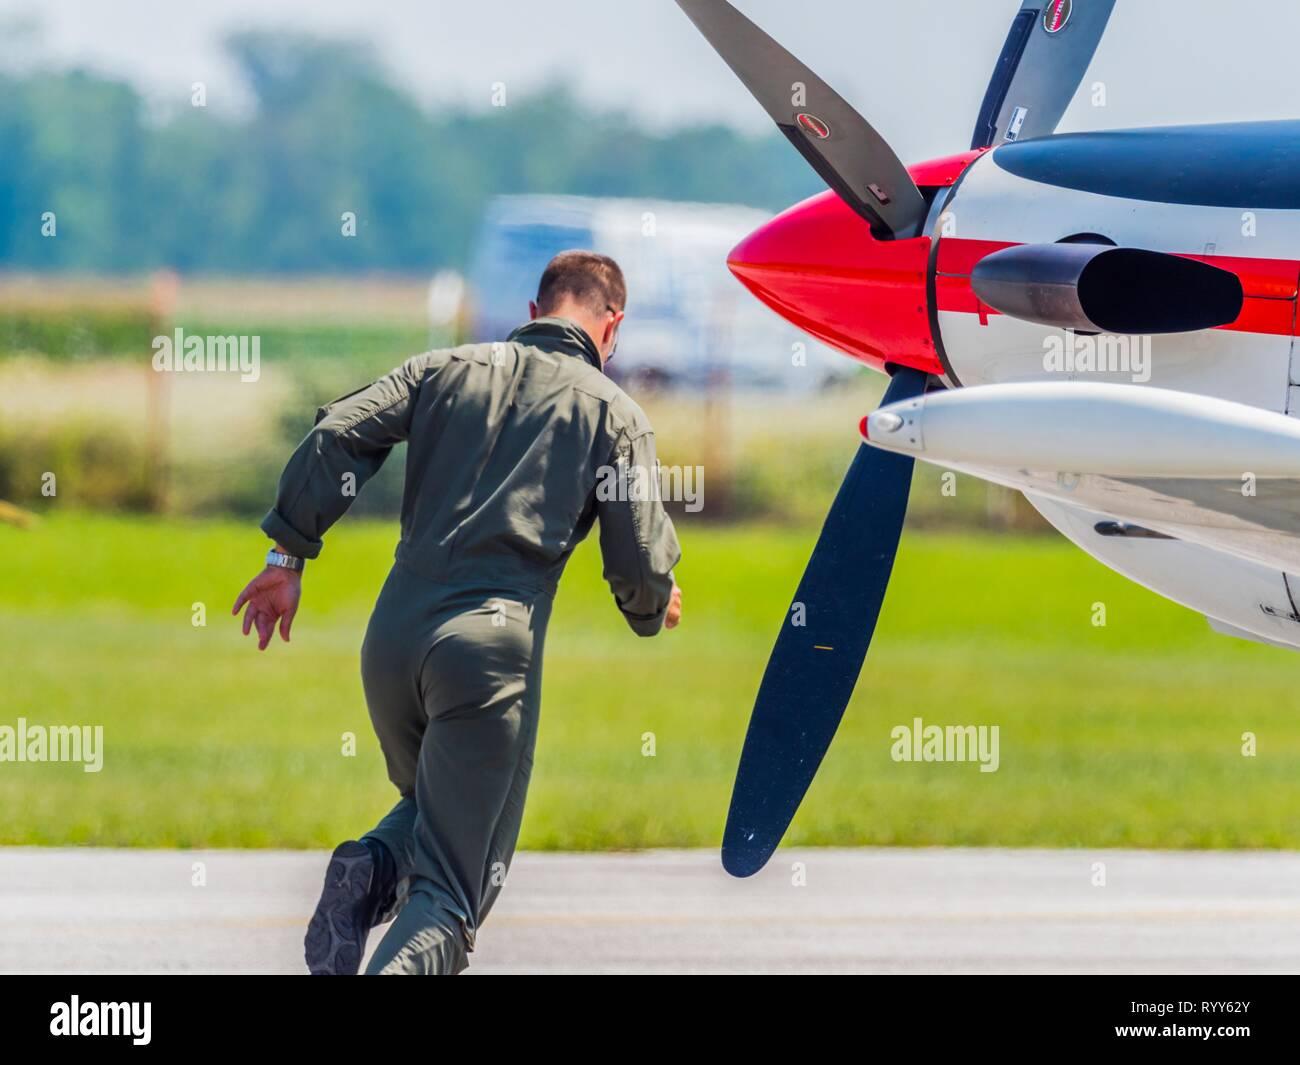 Pilatus PC9 PC-9 of Krila oluje Wings of storm aka scramble pilot running towards aircraft Stock Photo